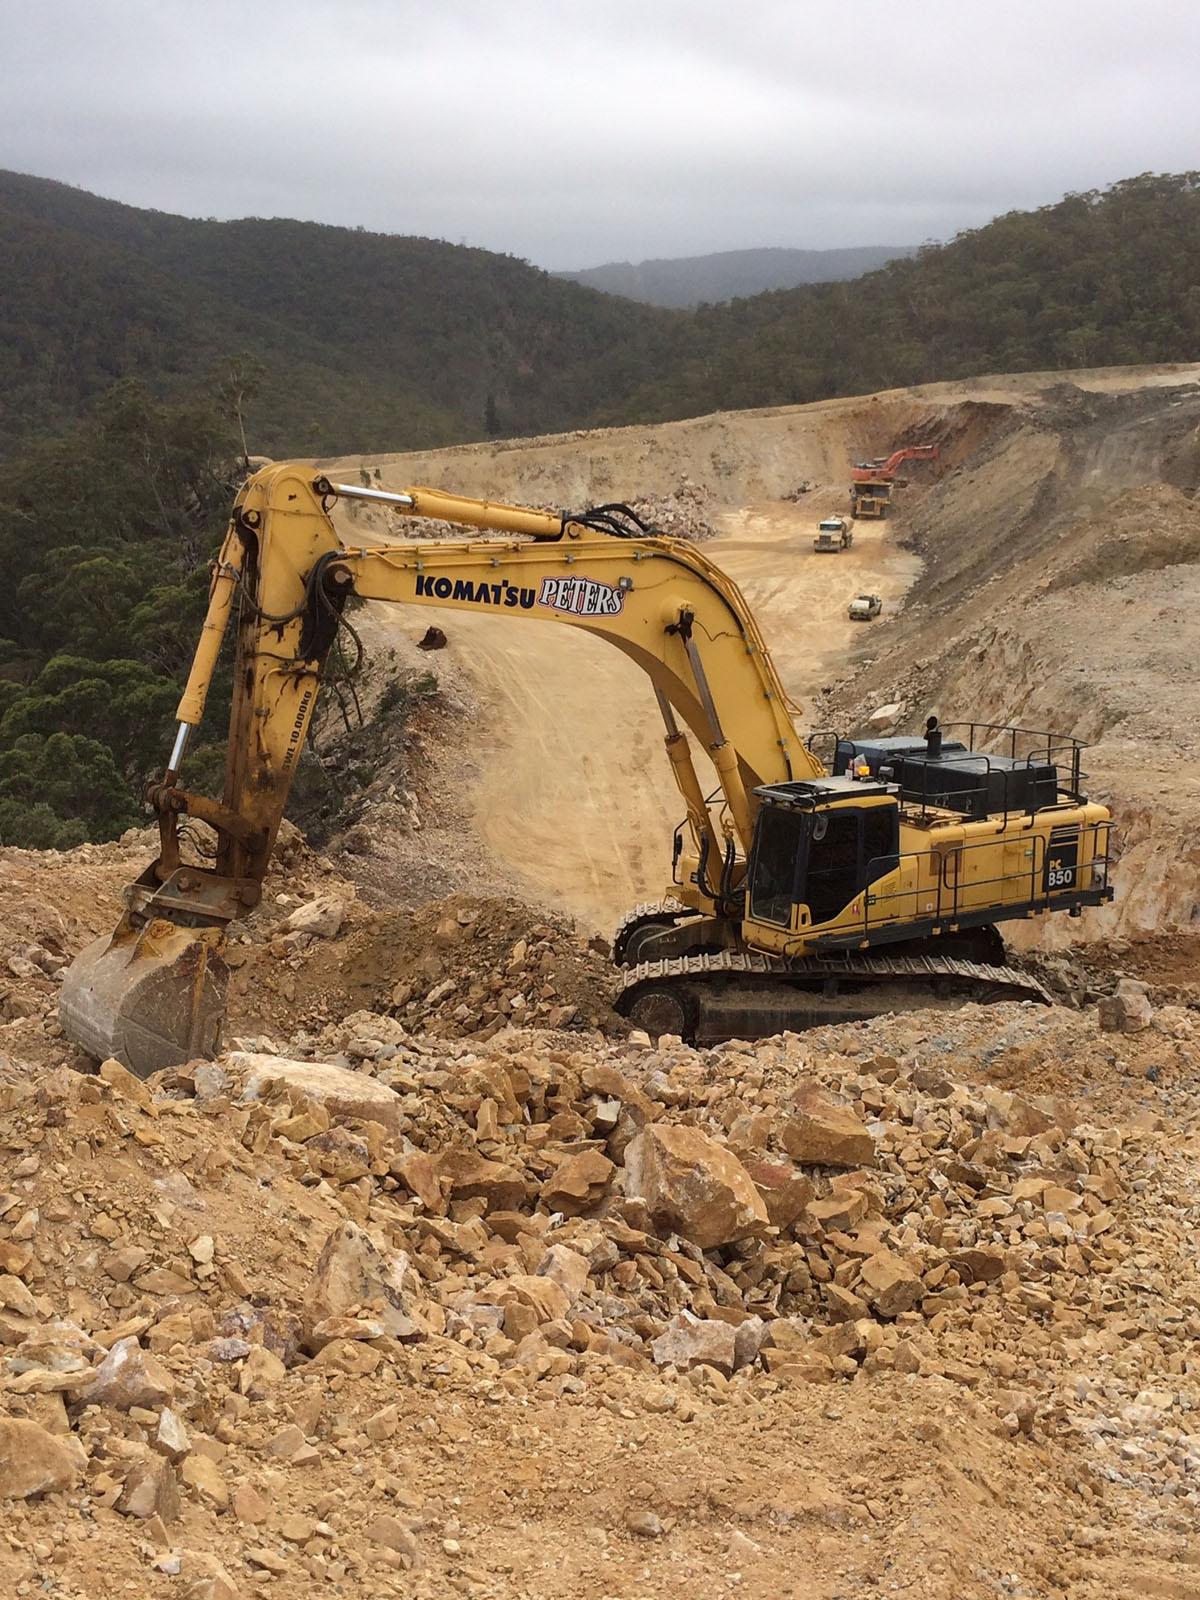 Peters Earthmoving Excavator digging